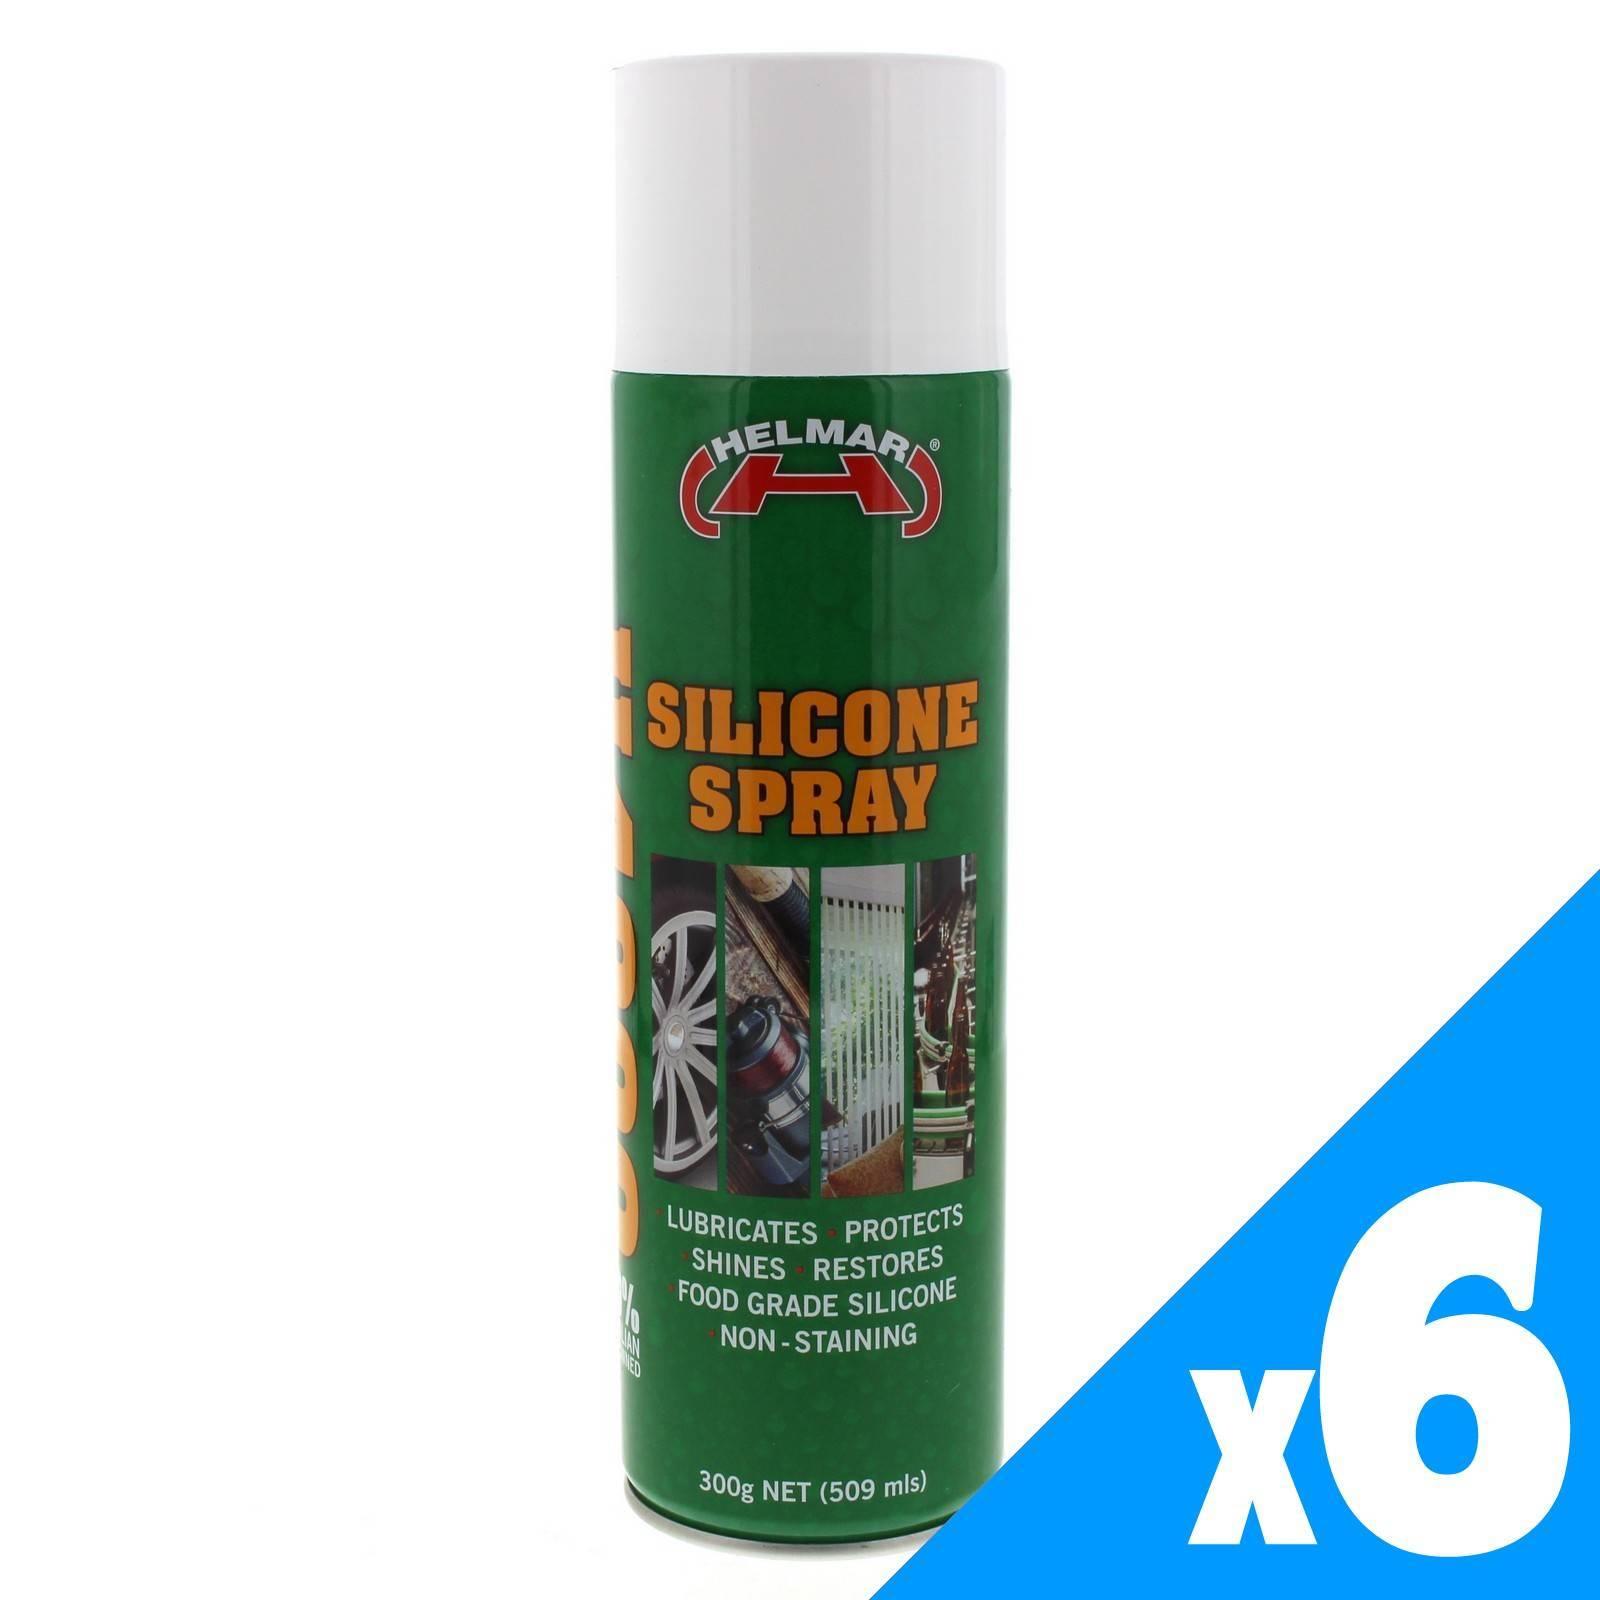 Silicone Spray Lubricant Protect Shine Restore 300g Aerosol Spray Can 6 Pack